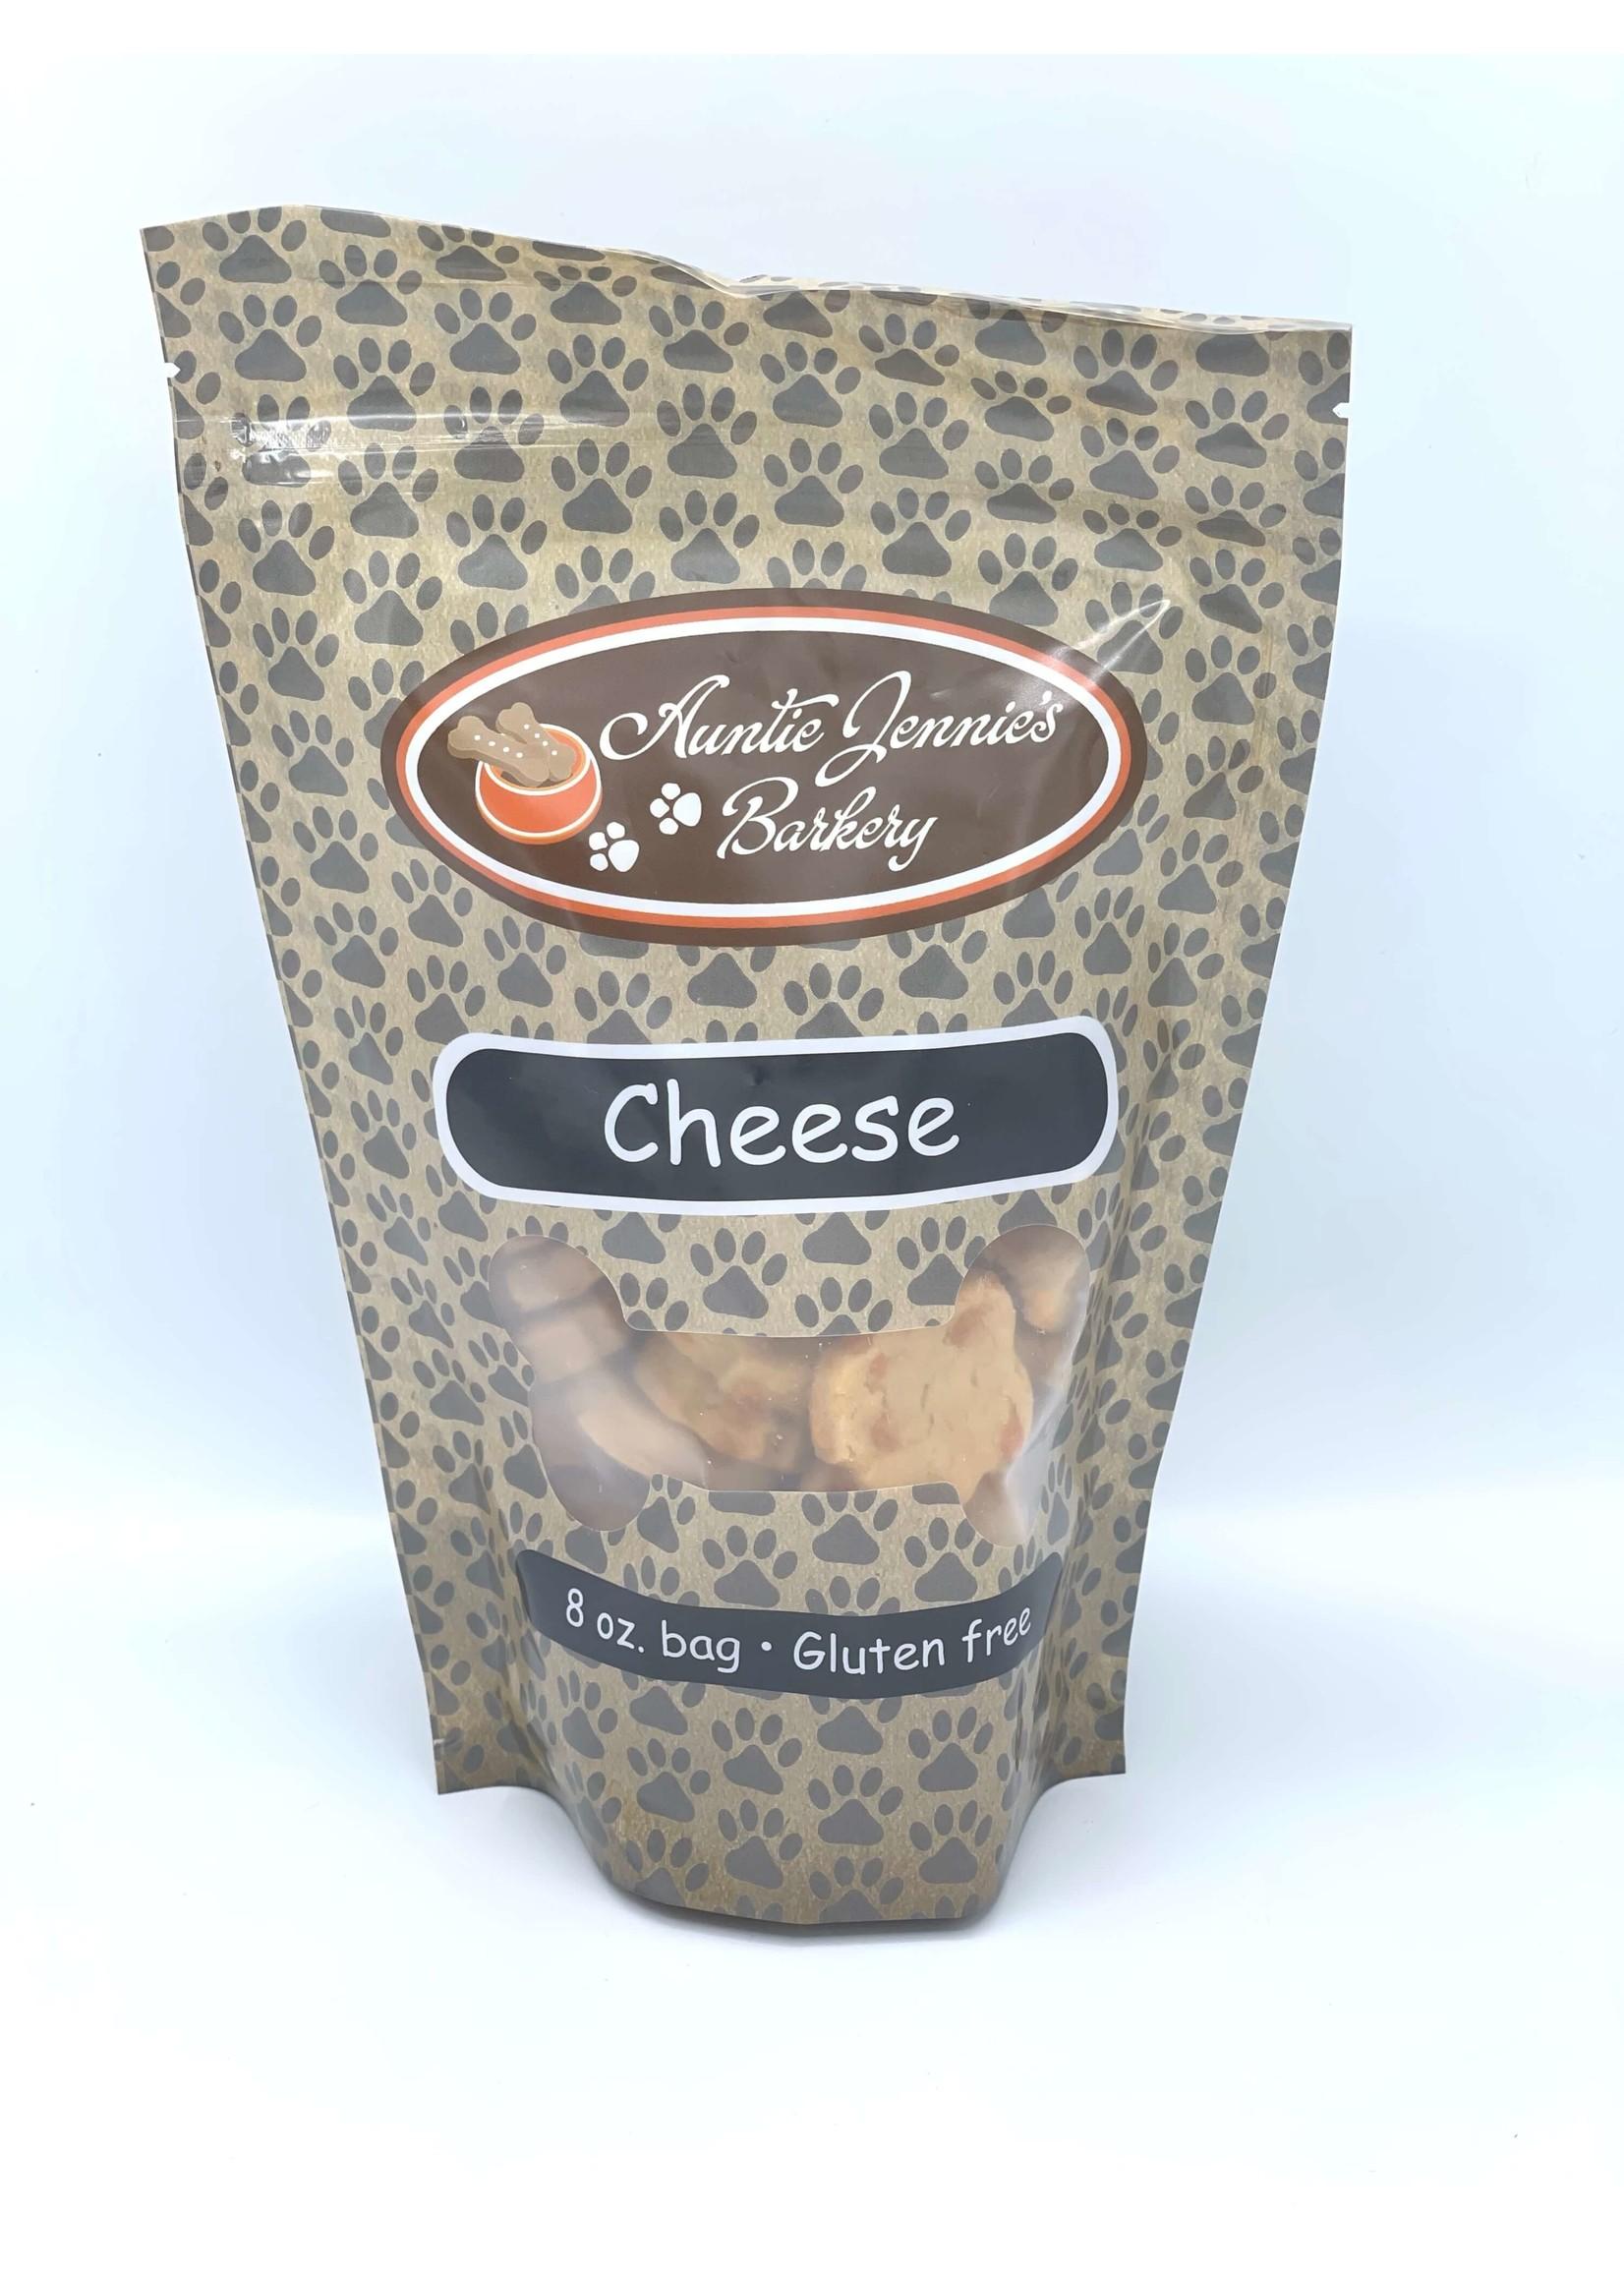 Aunt Jennie's Barkery Cheese Flavor